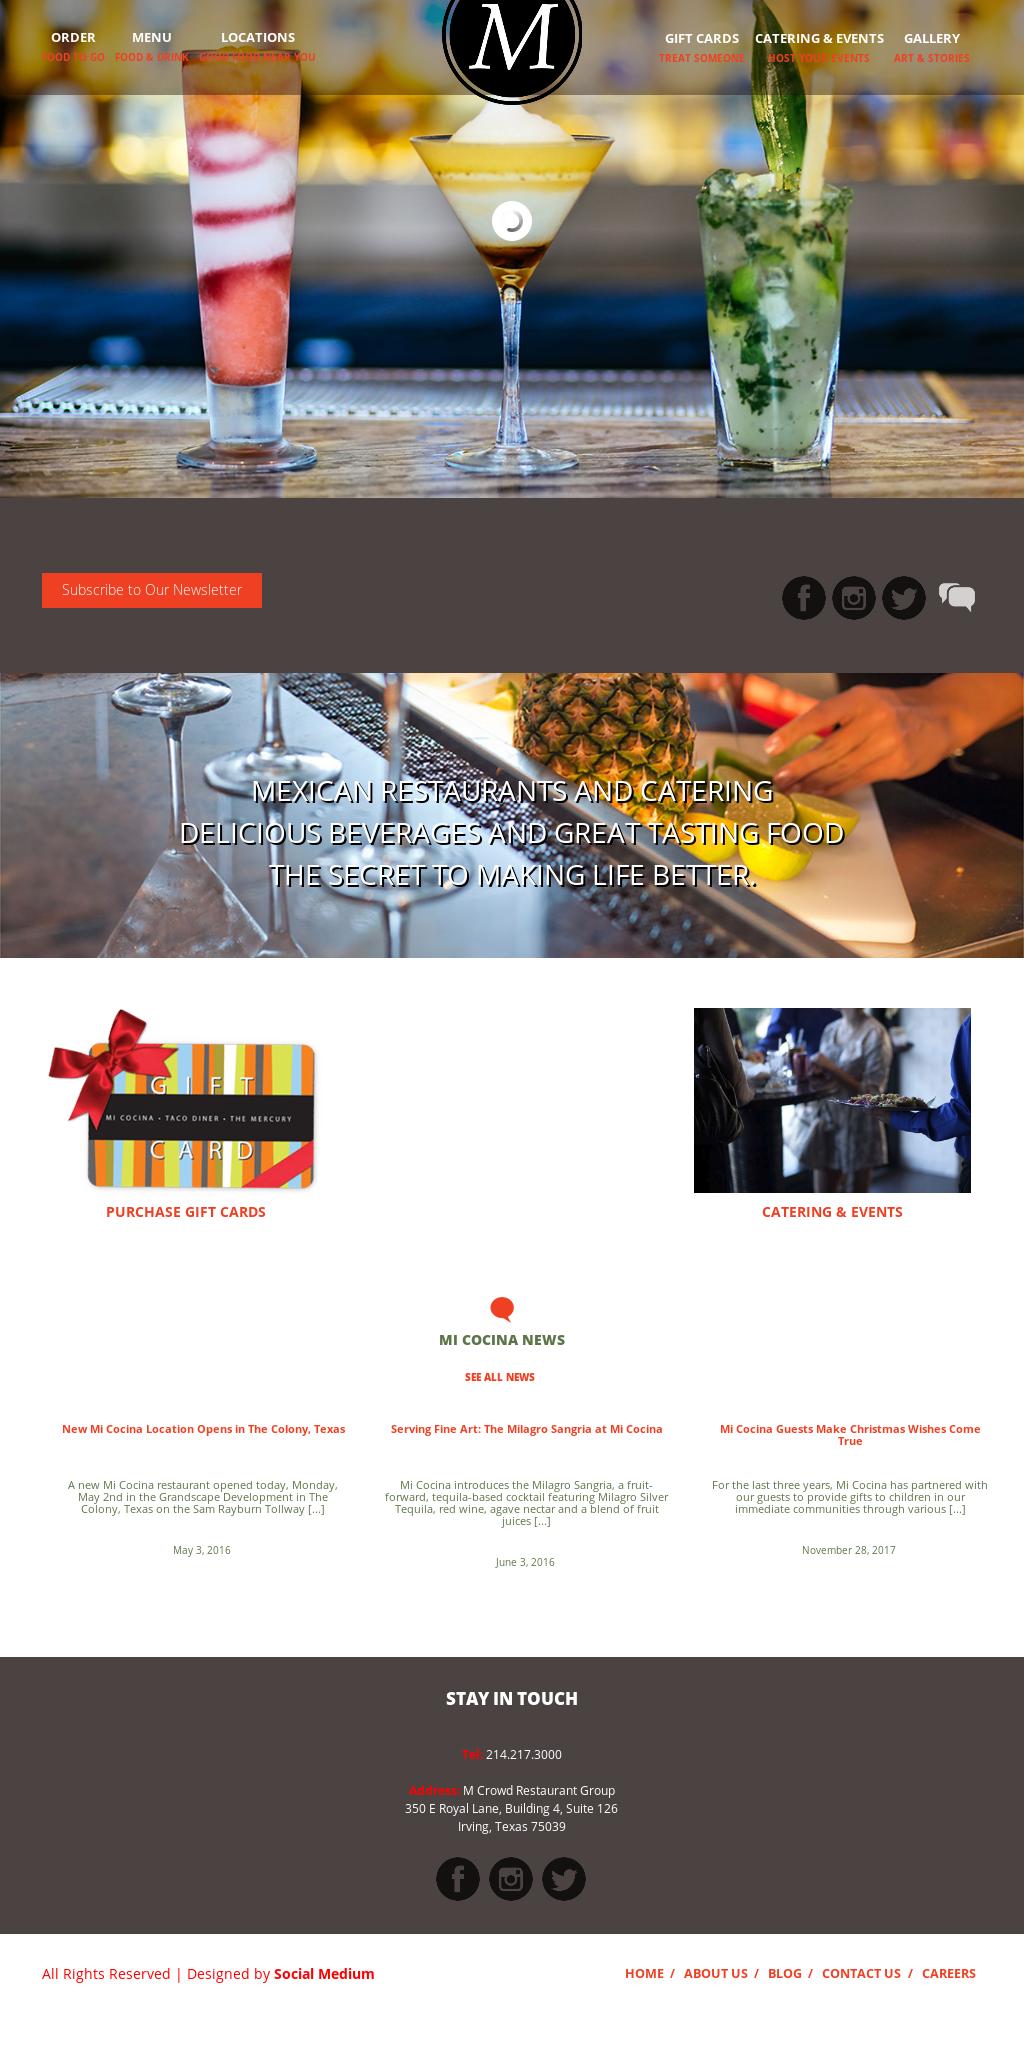 Mi Cocina Restaurants Competitors, Revenue and Employees - Owler ...